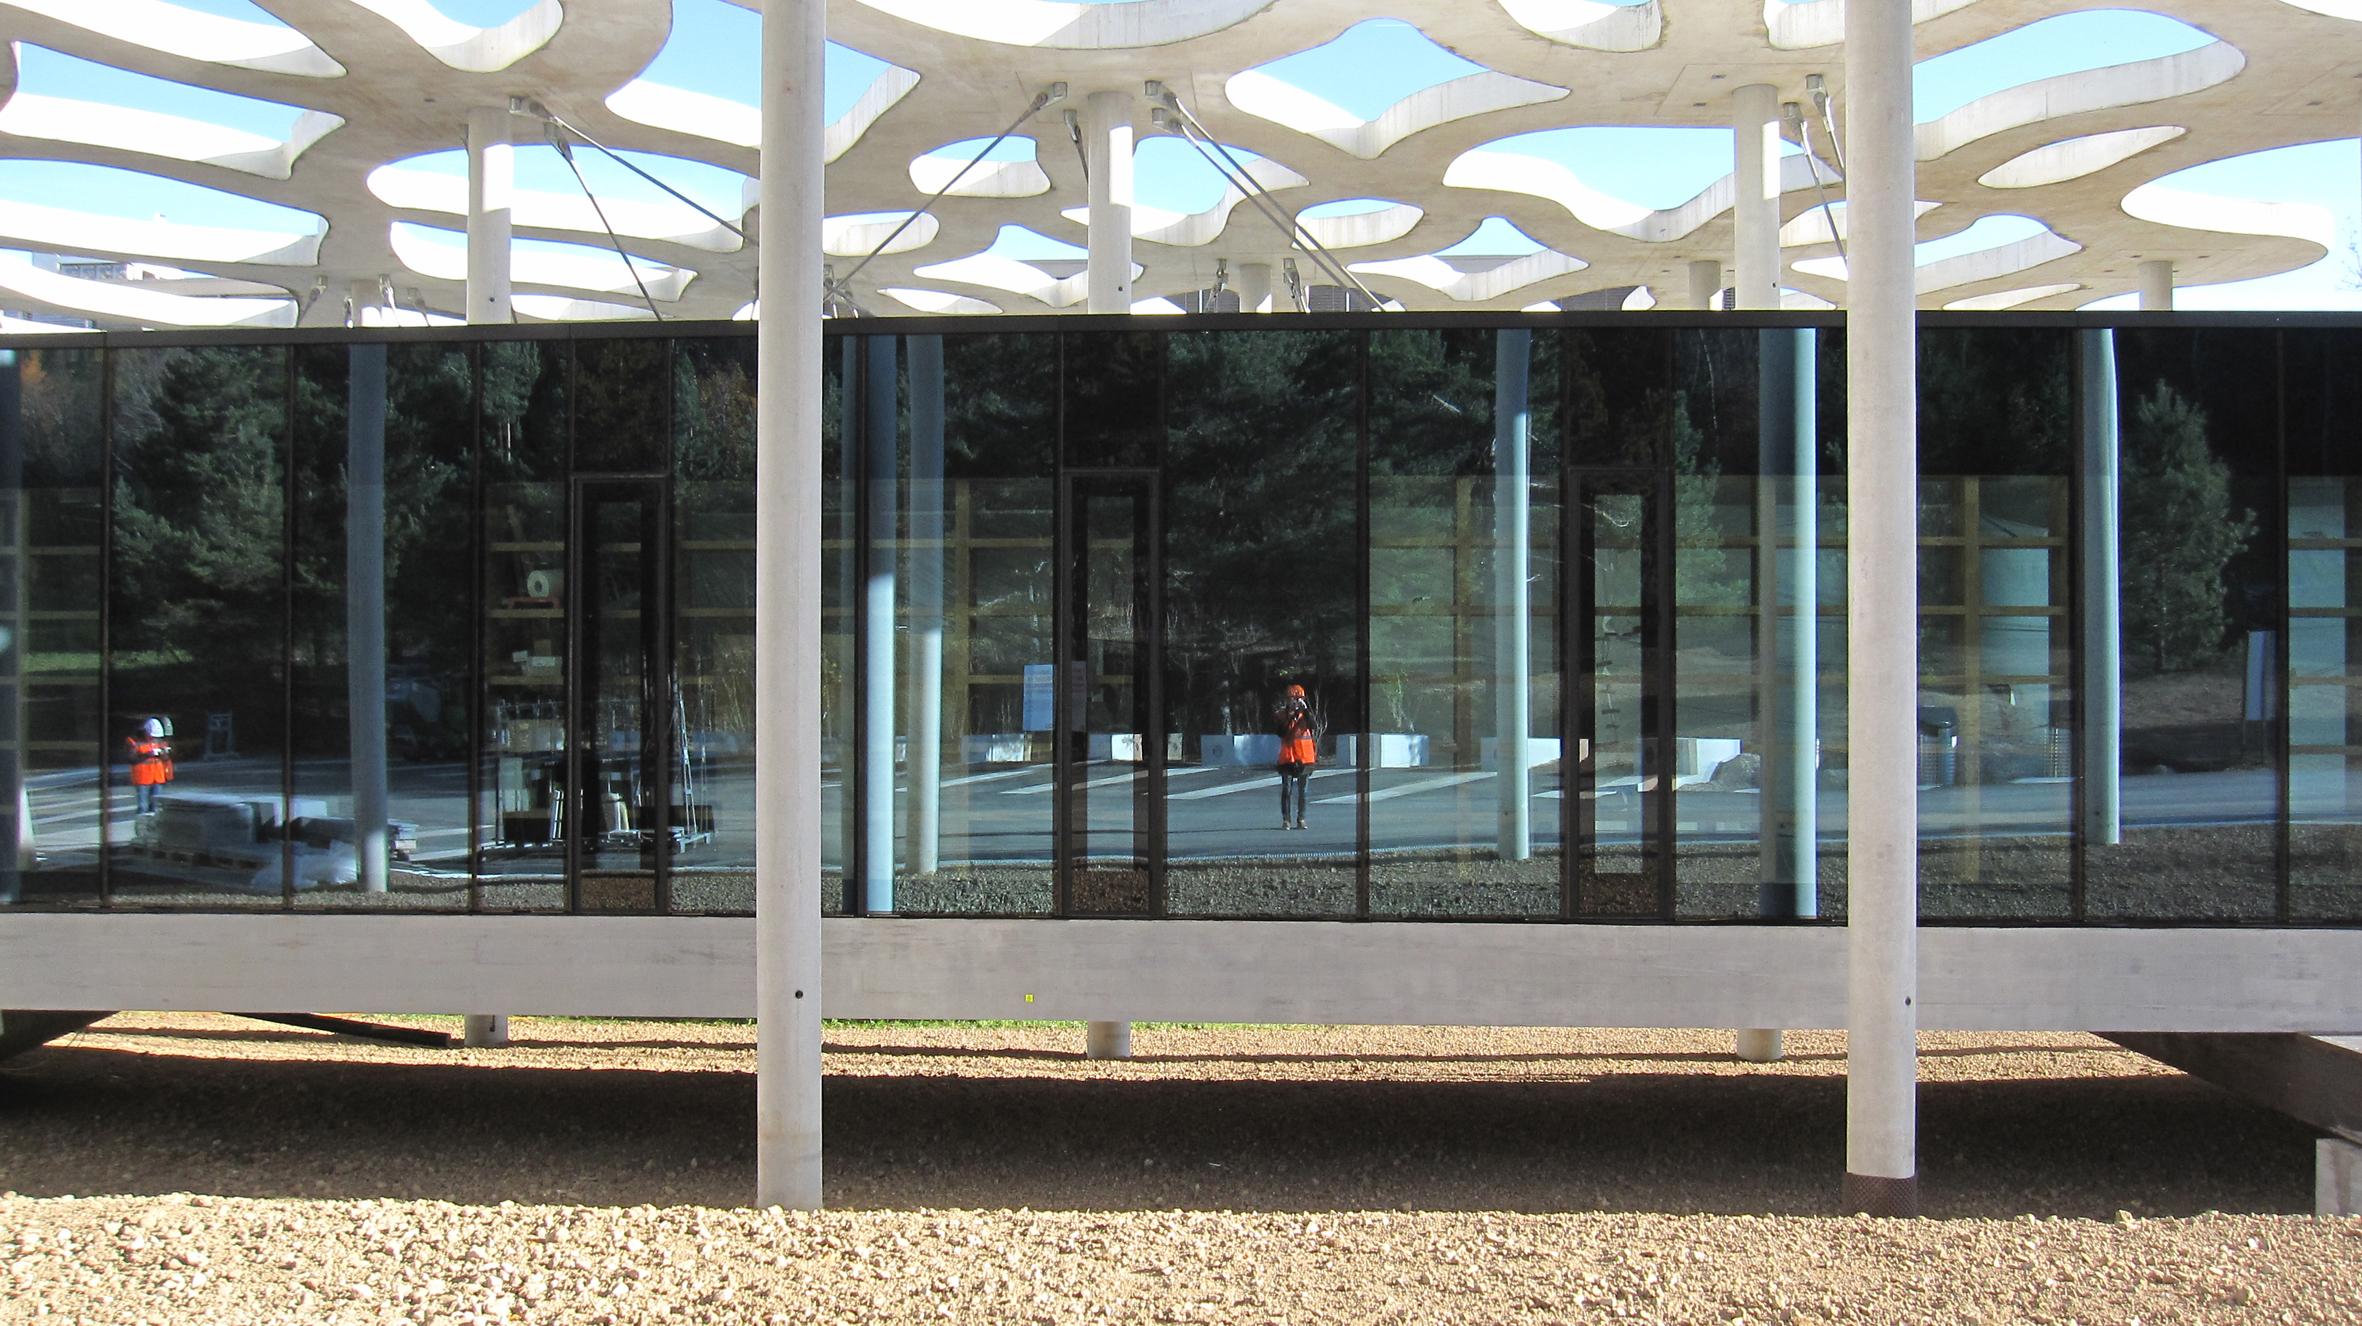 This Elemental design was for a writer's cabin for the Jan Michalski Foundation in Montricher, Switzerland. Photo by +2 Architectes